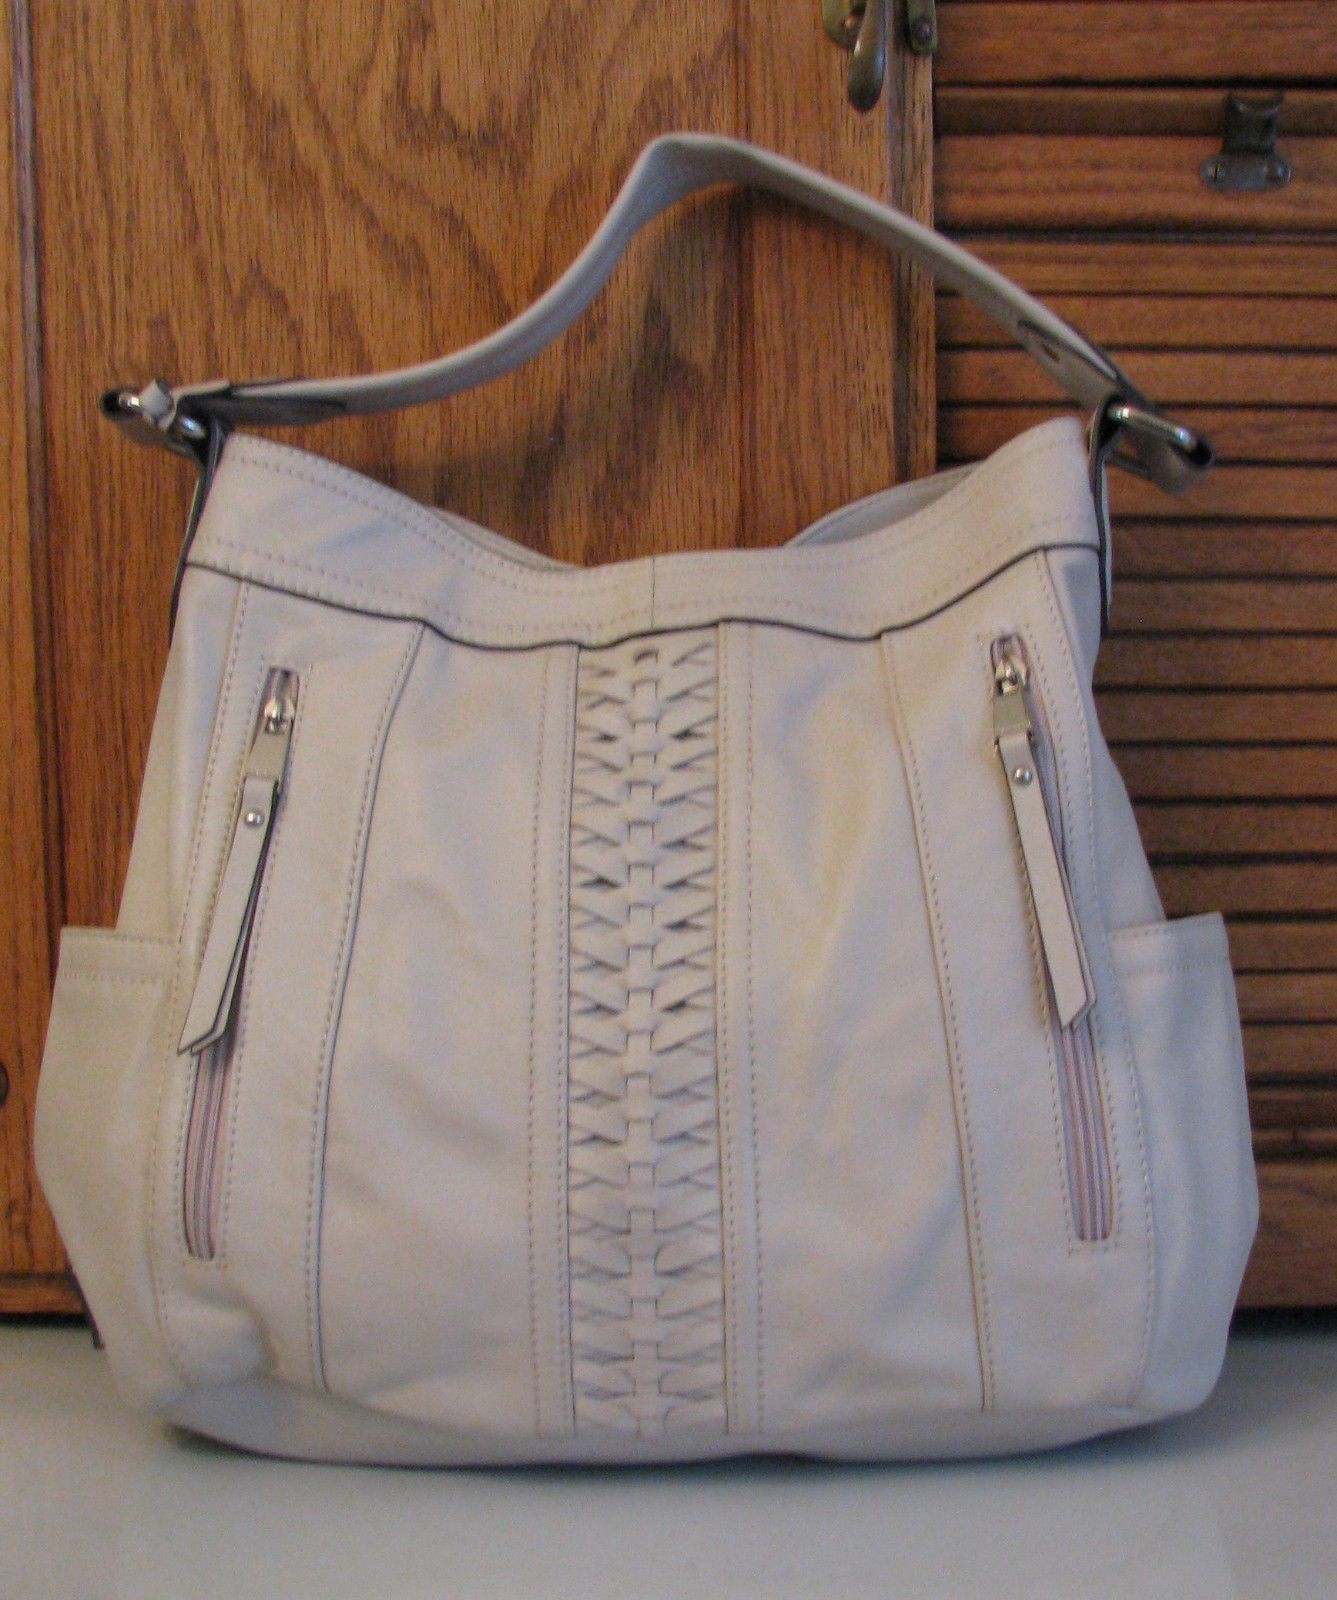 Tignanello Leather PURSE Bone Handbag Pocketbook Fancy Tote - $23.75